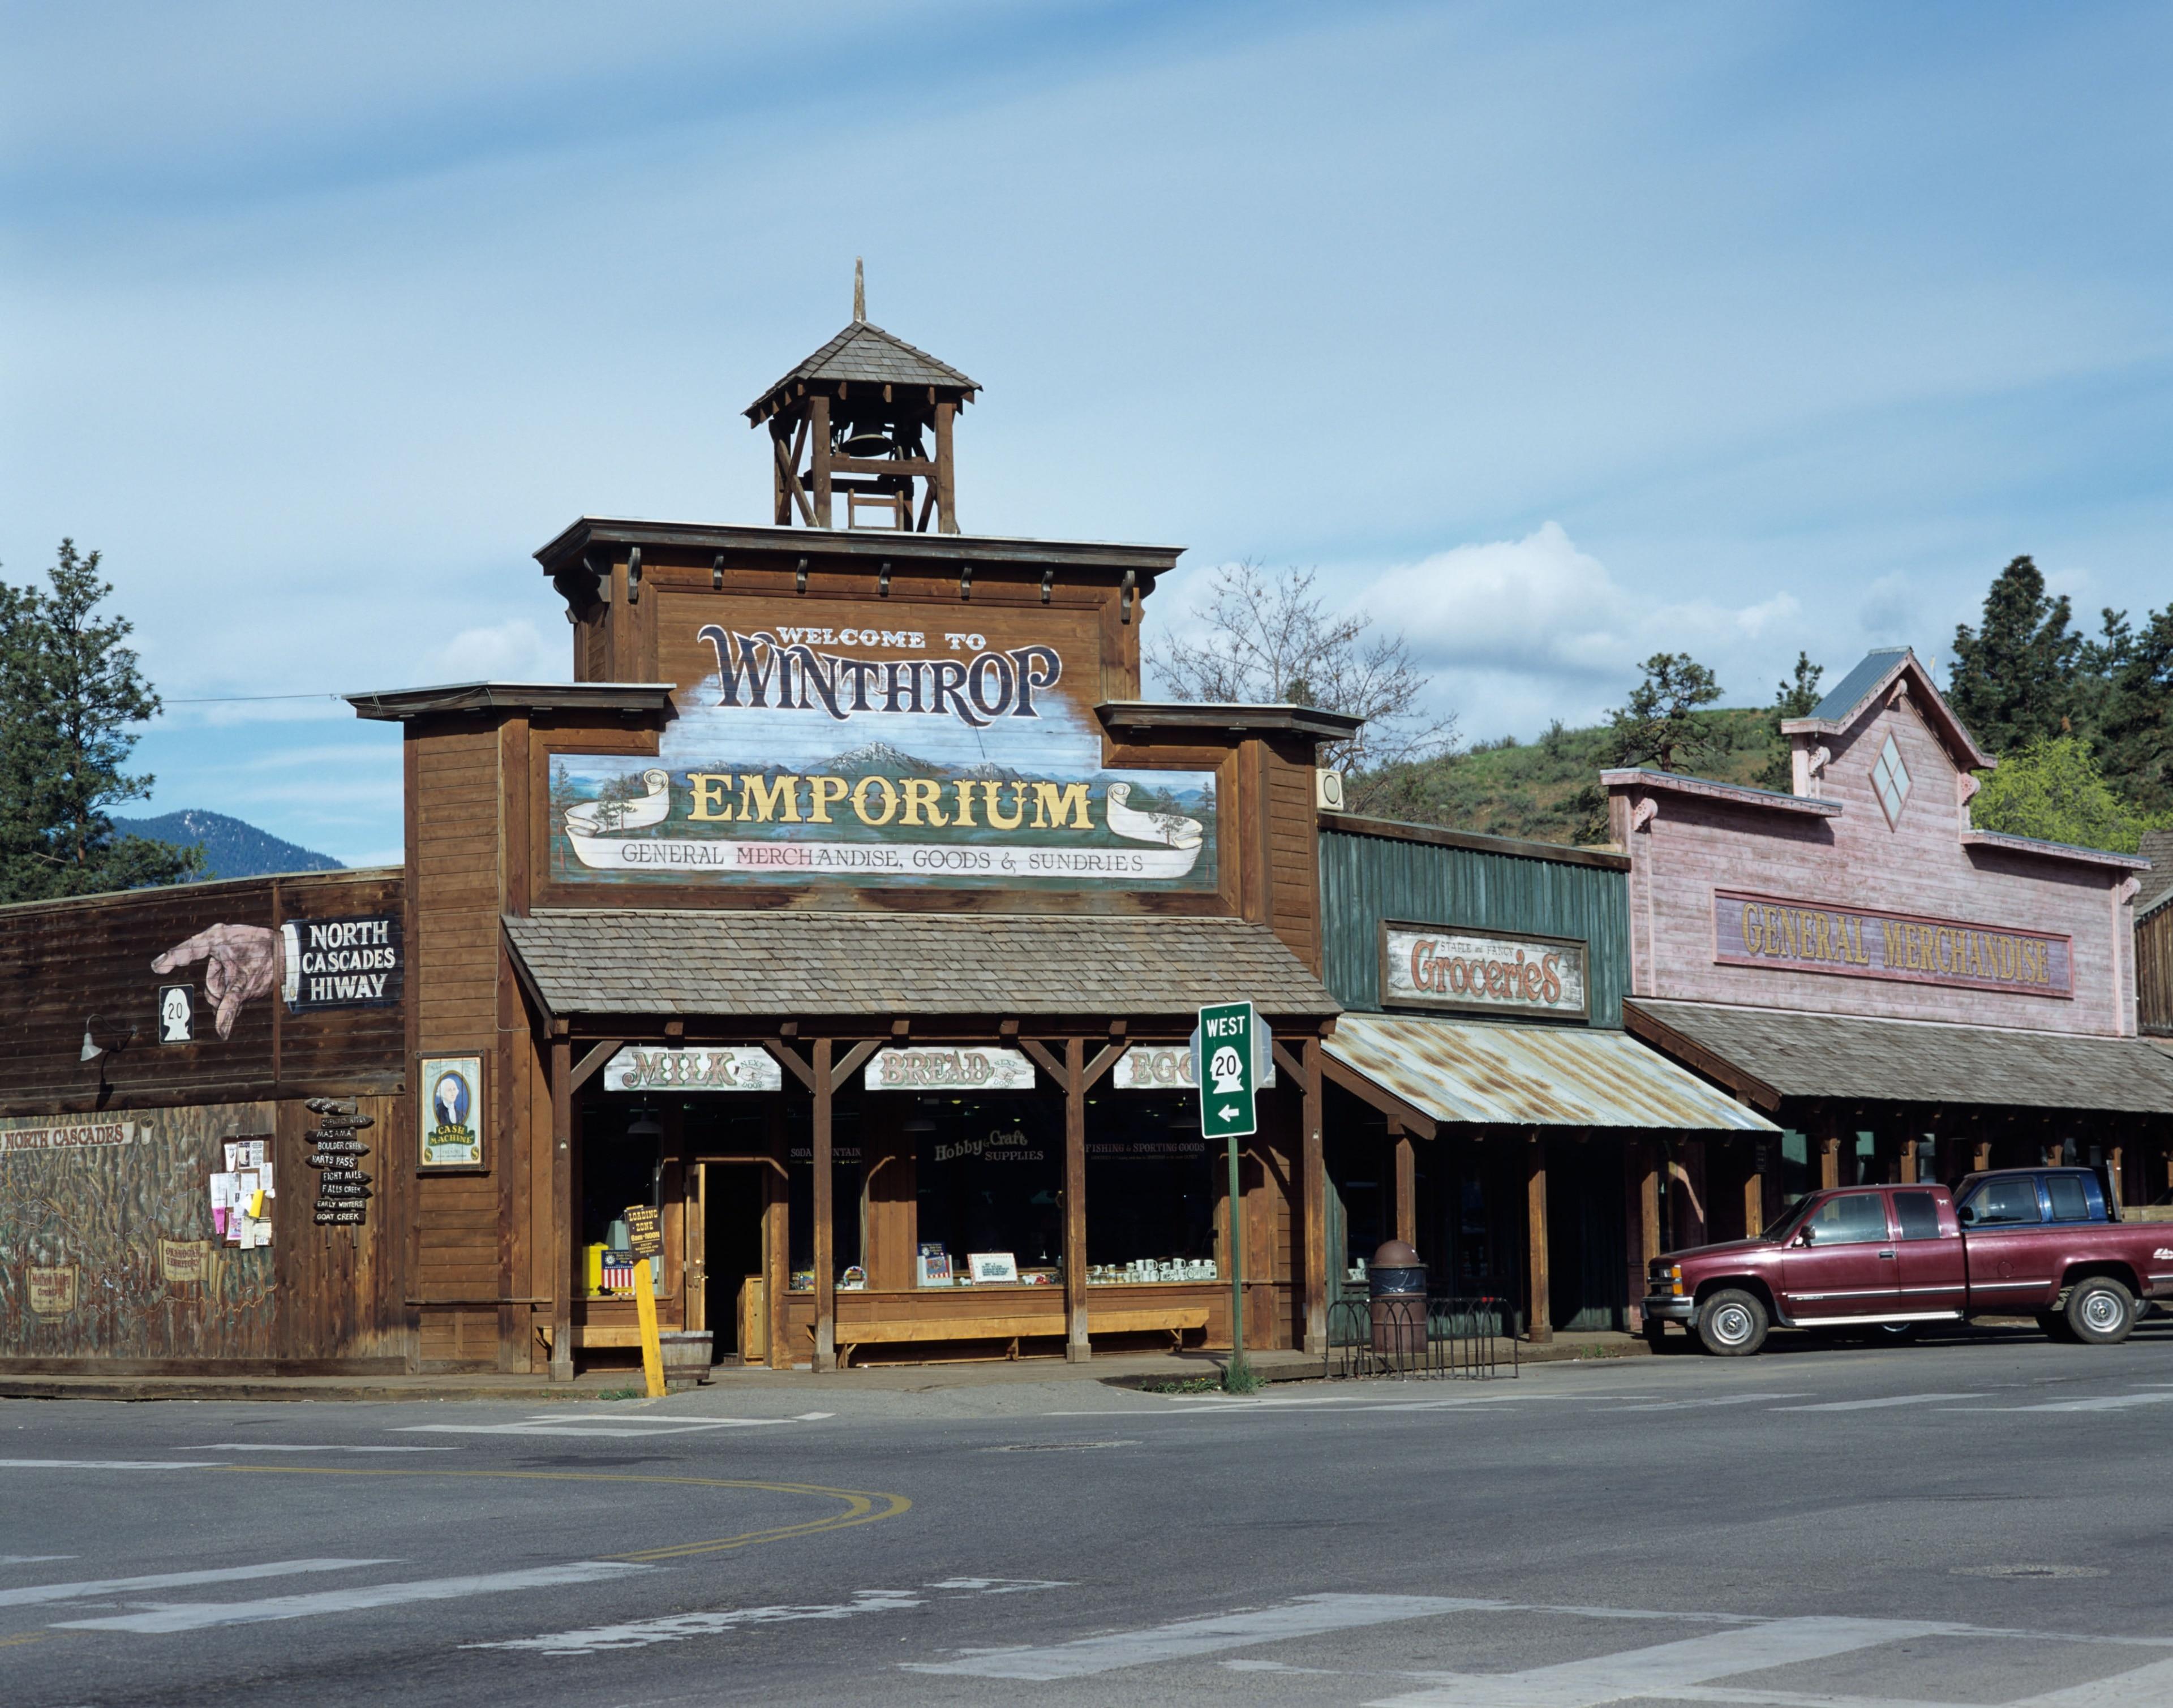 Methow Valley, Washington, United States of America